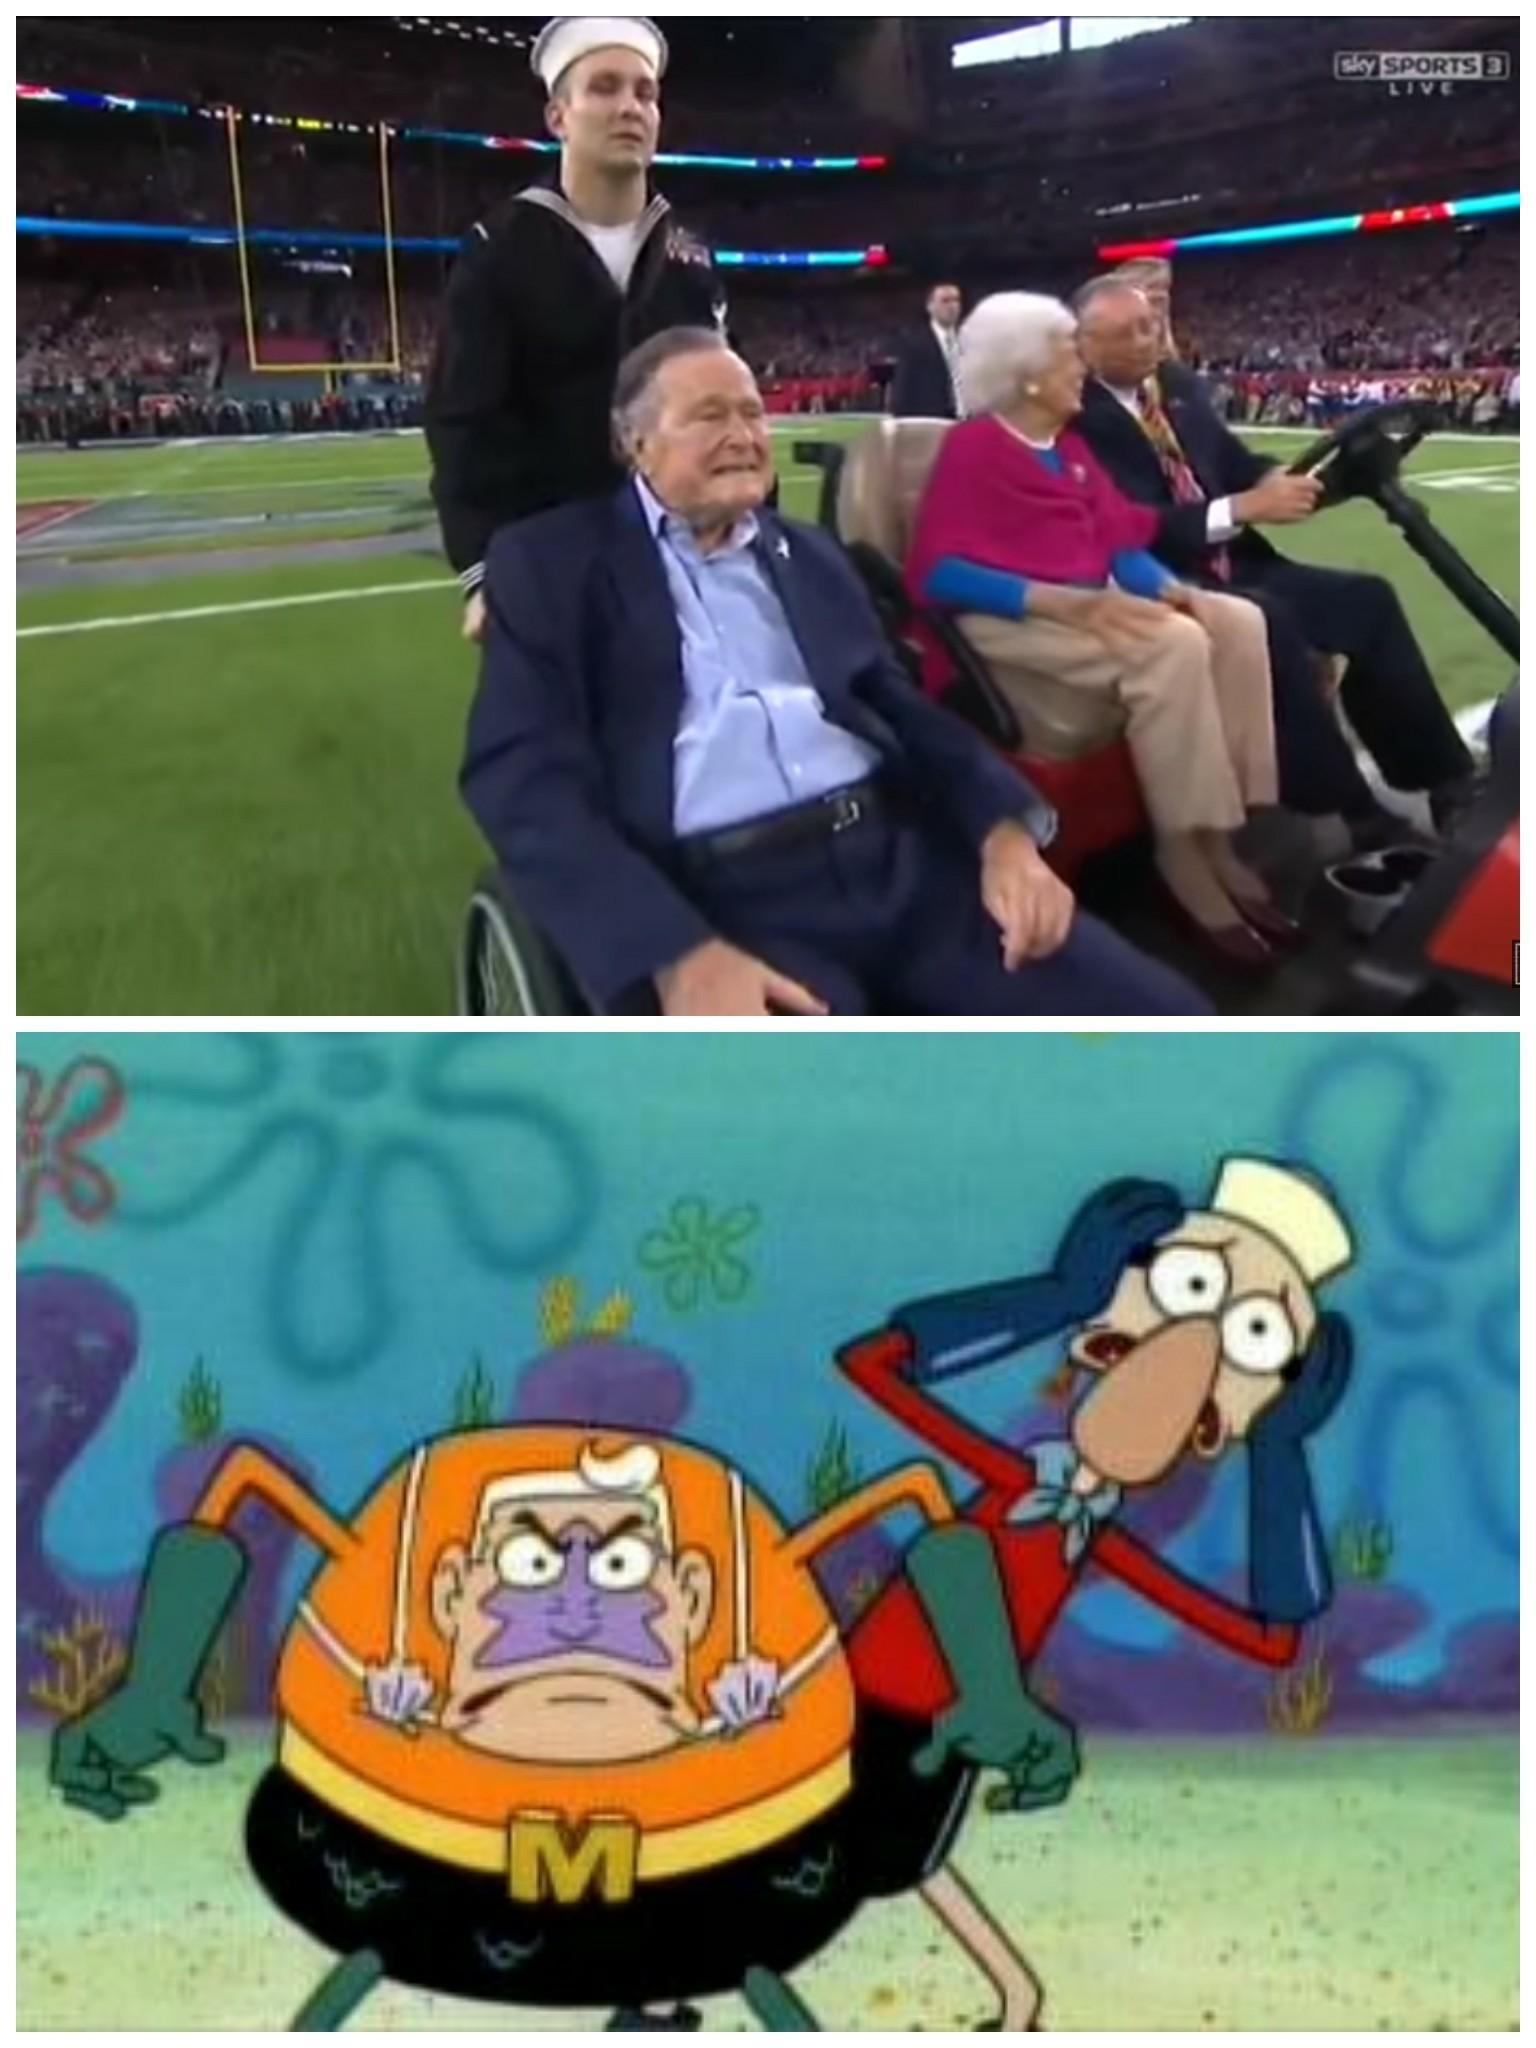 Spongebob's half time show was better - meme